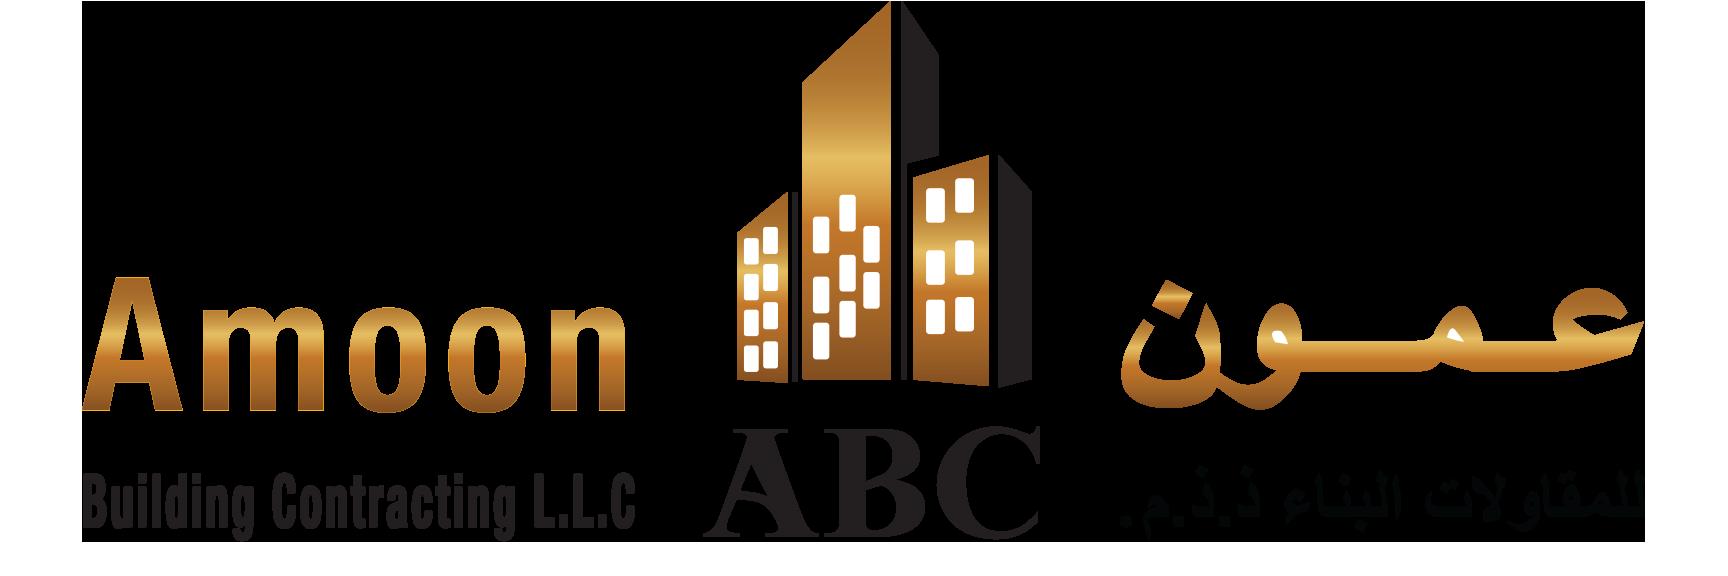 Amoon Building Contracting LLC